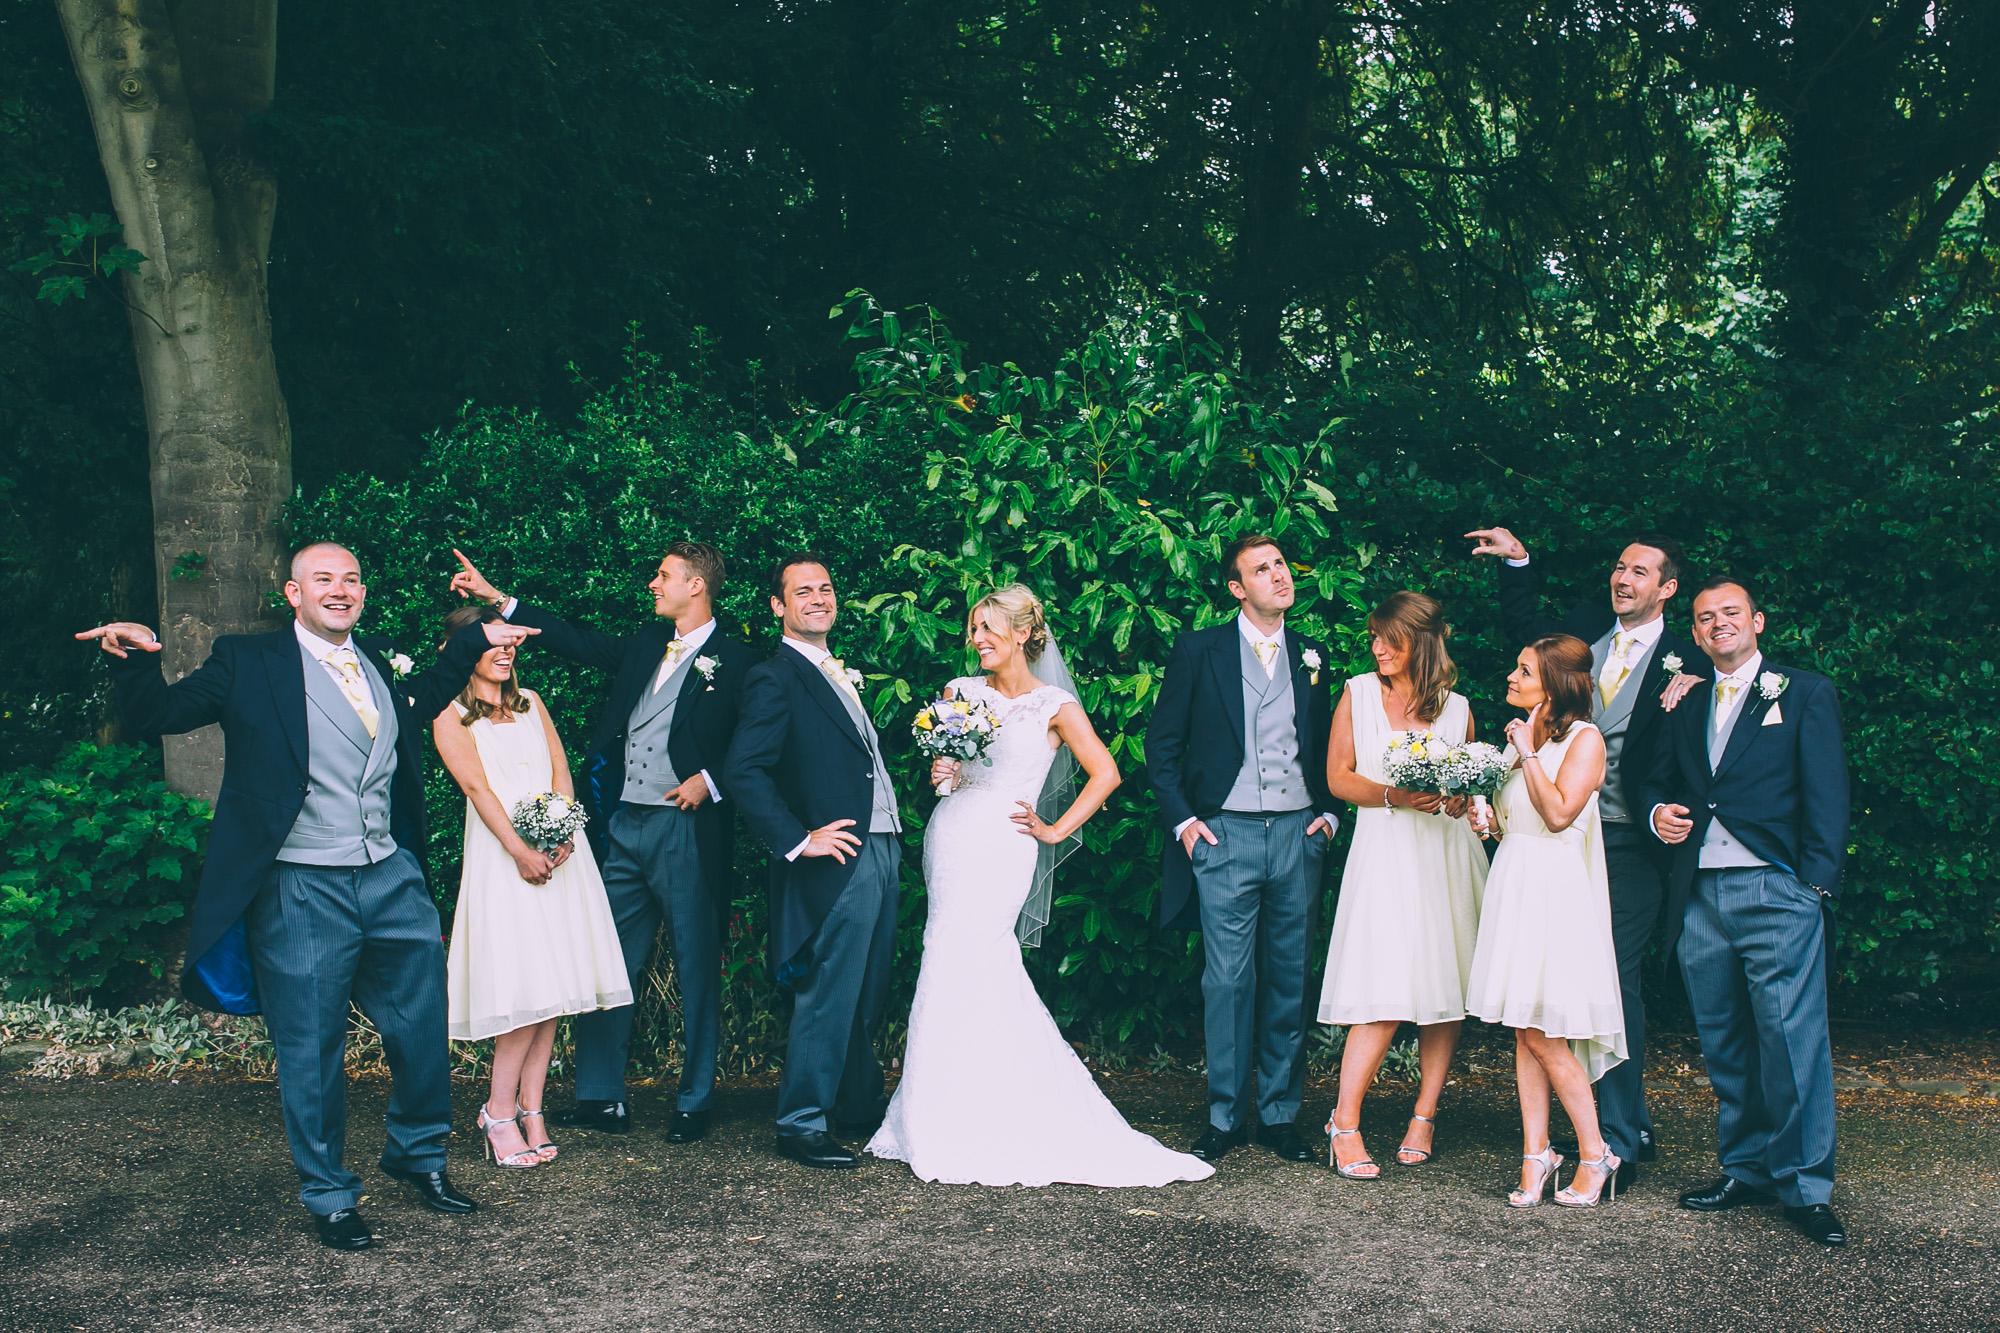 Laura&Mark_Wedding_tombiddle_tb239.jpg